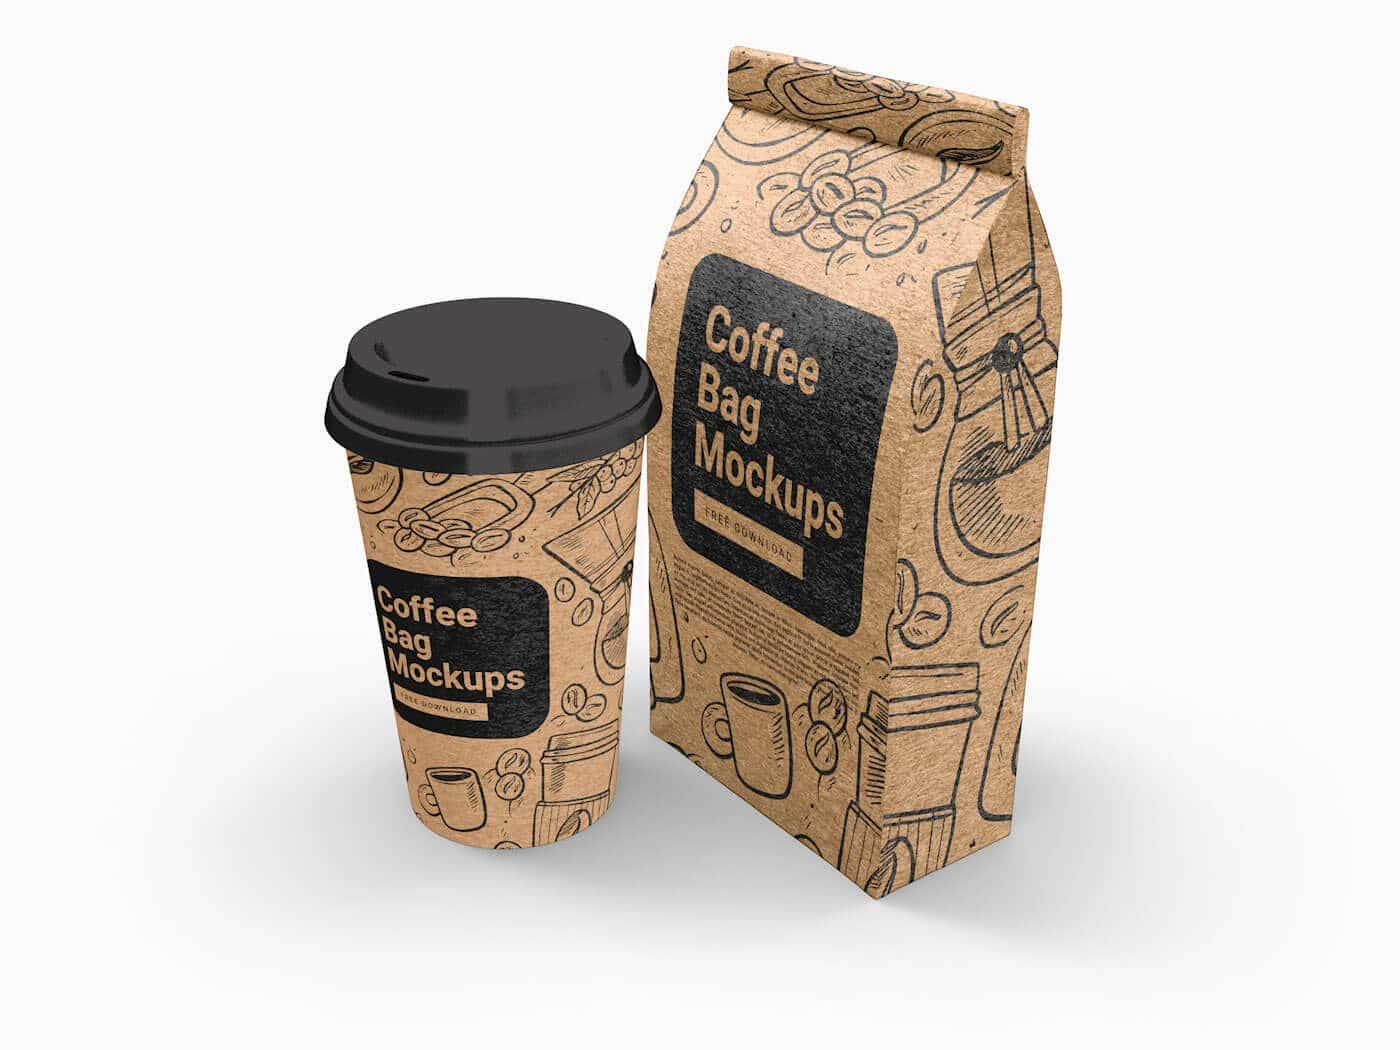 Cup and Coffee Bag Free Mockups 02